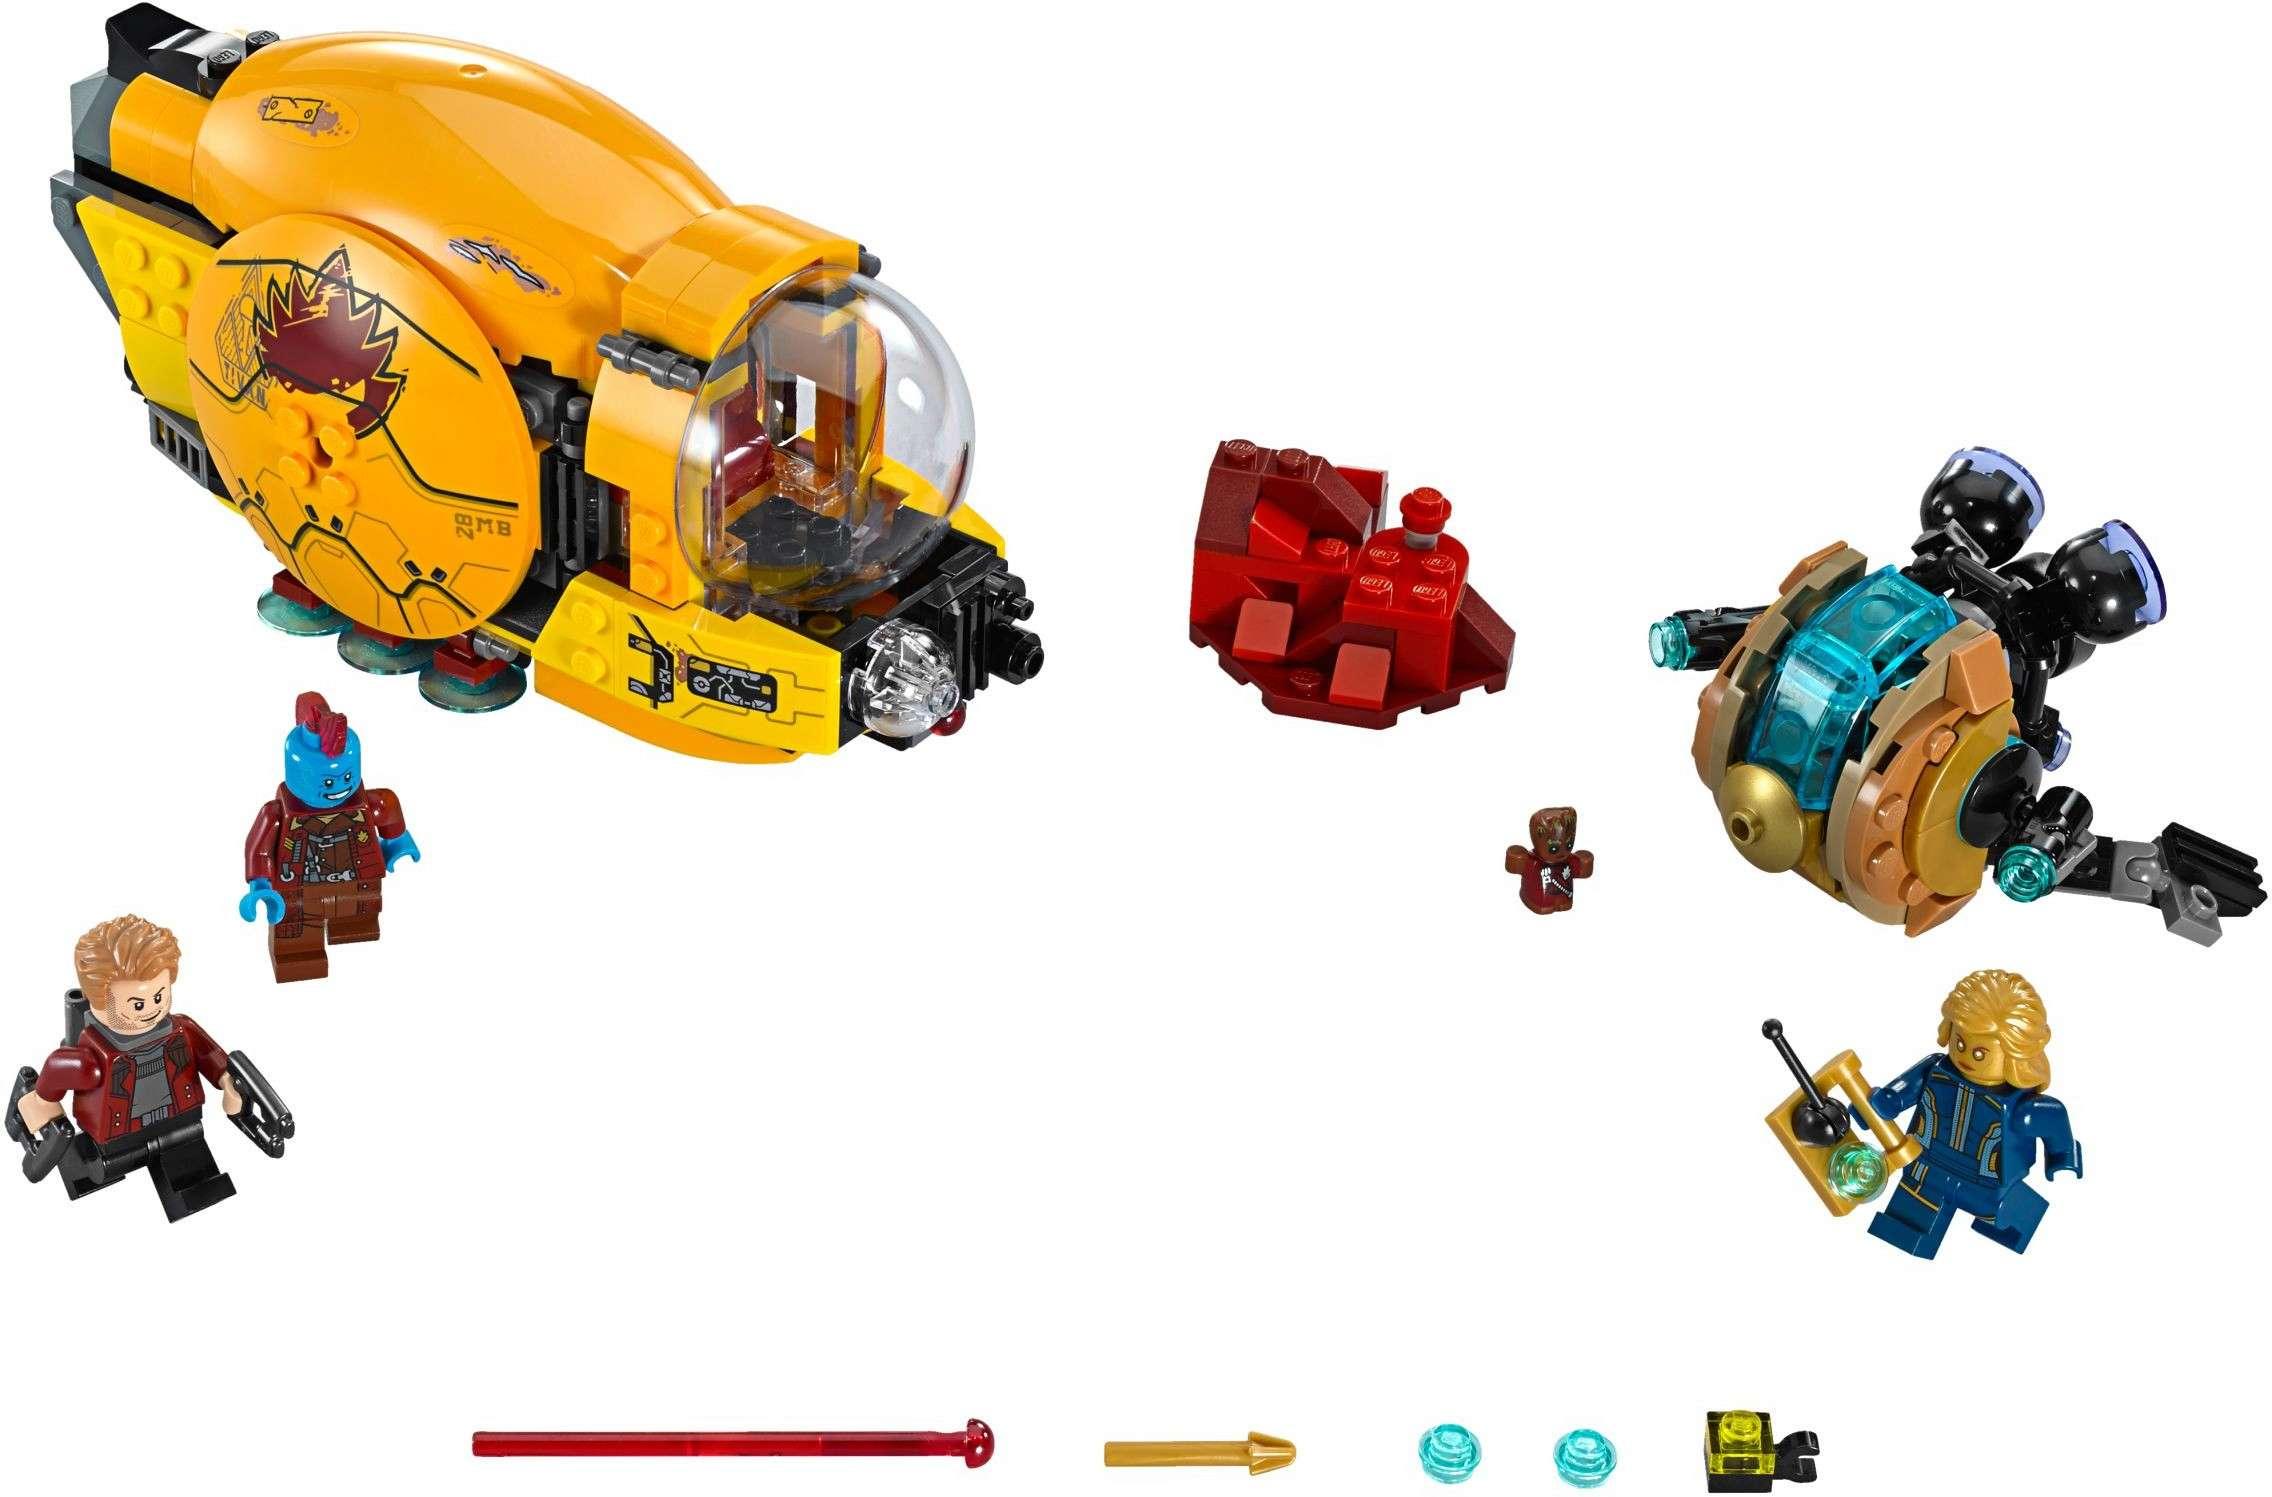 [LEGO] Les Gardiens de la Galaxie Vol. 2 : les ensembles du film 76080-10